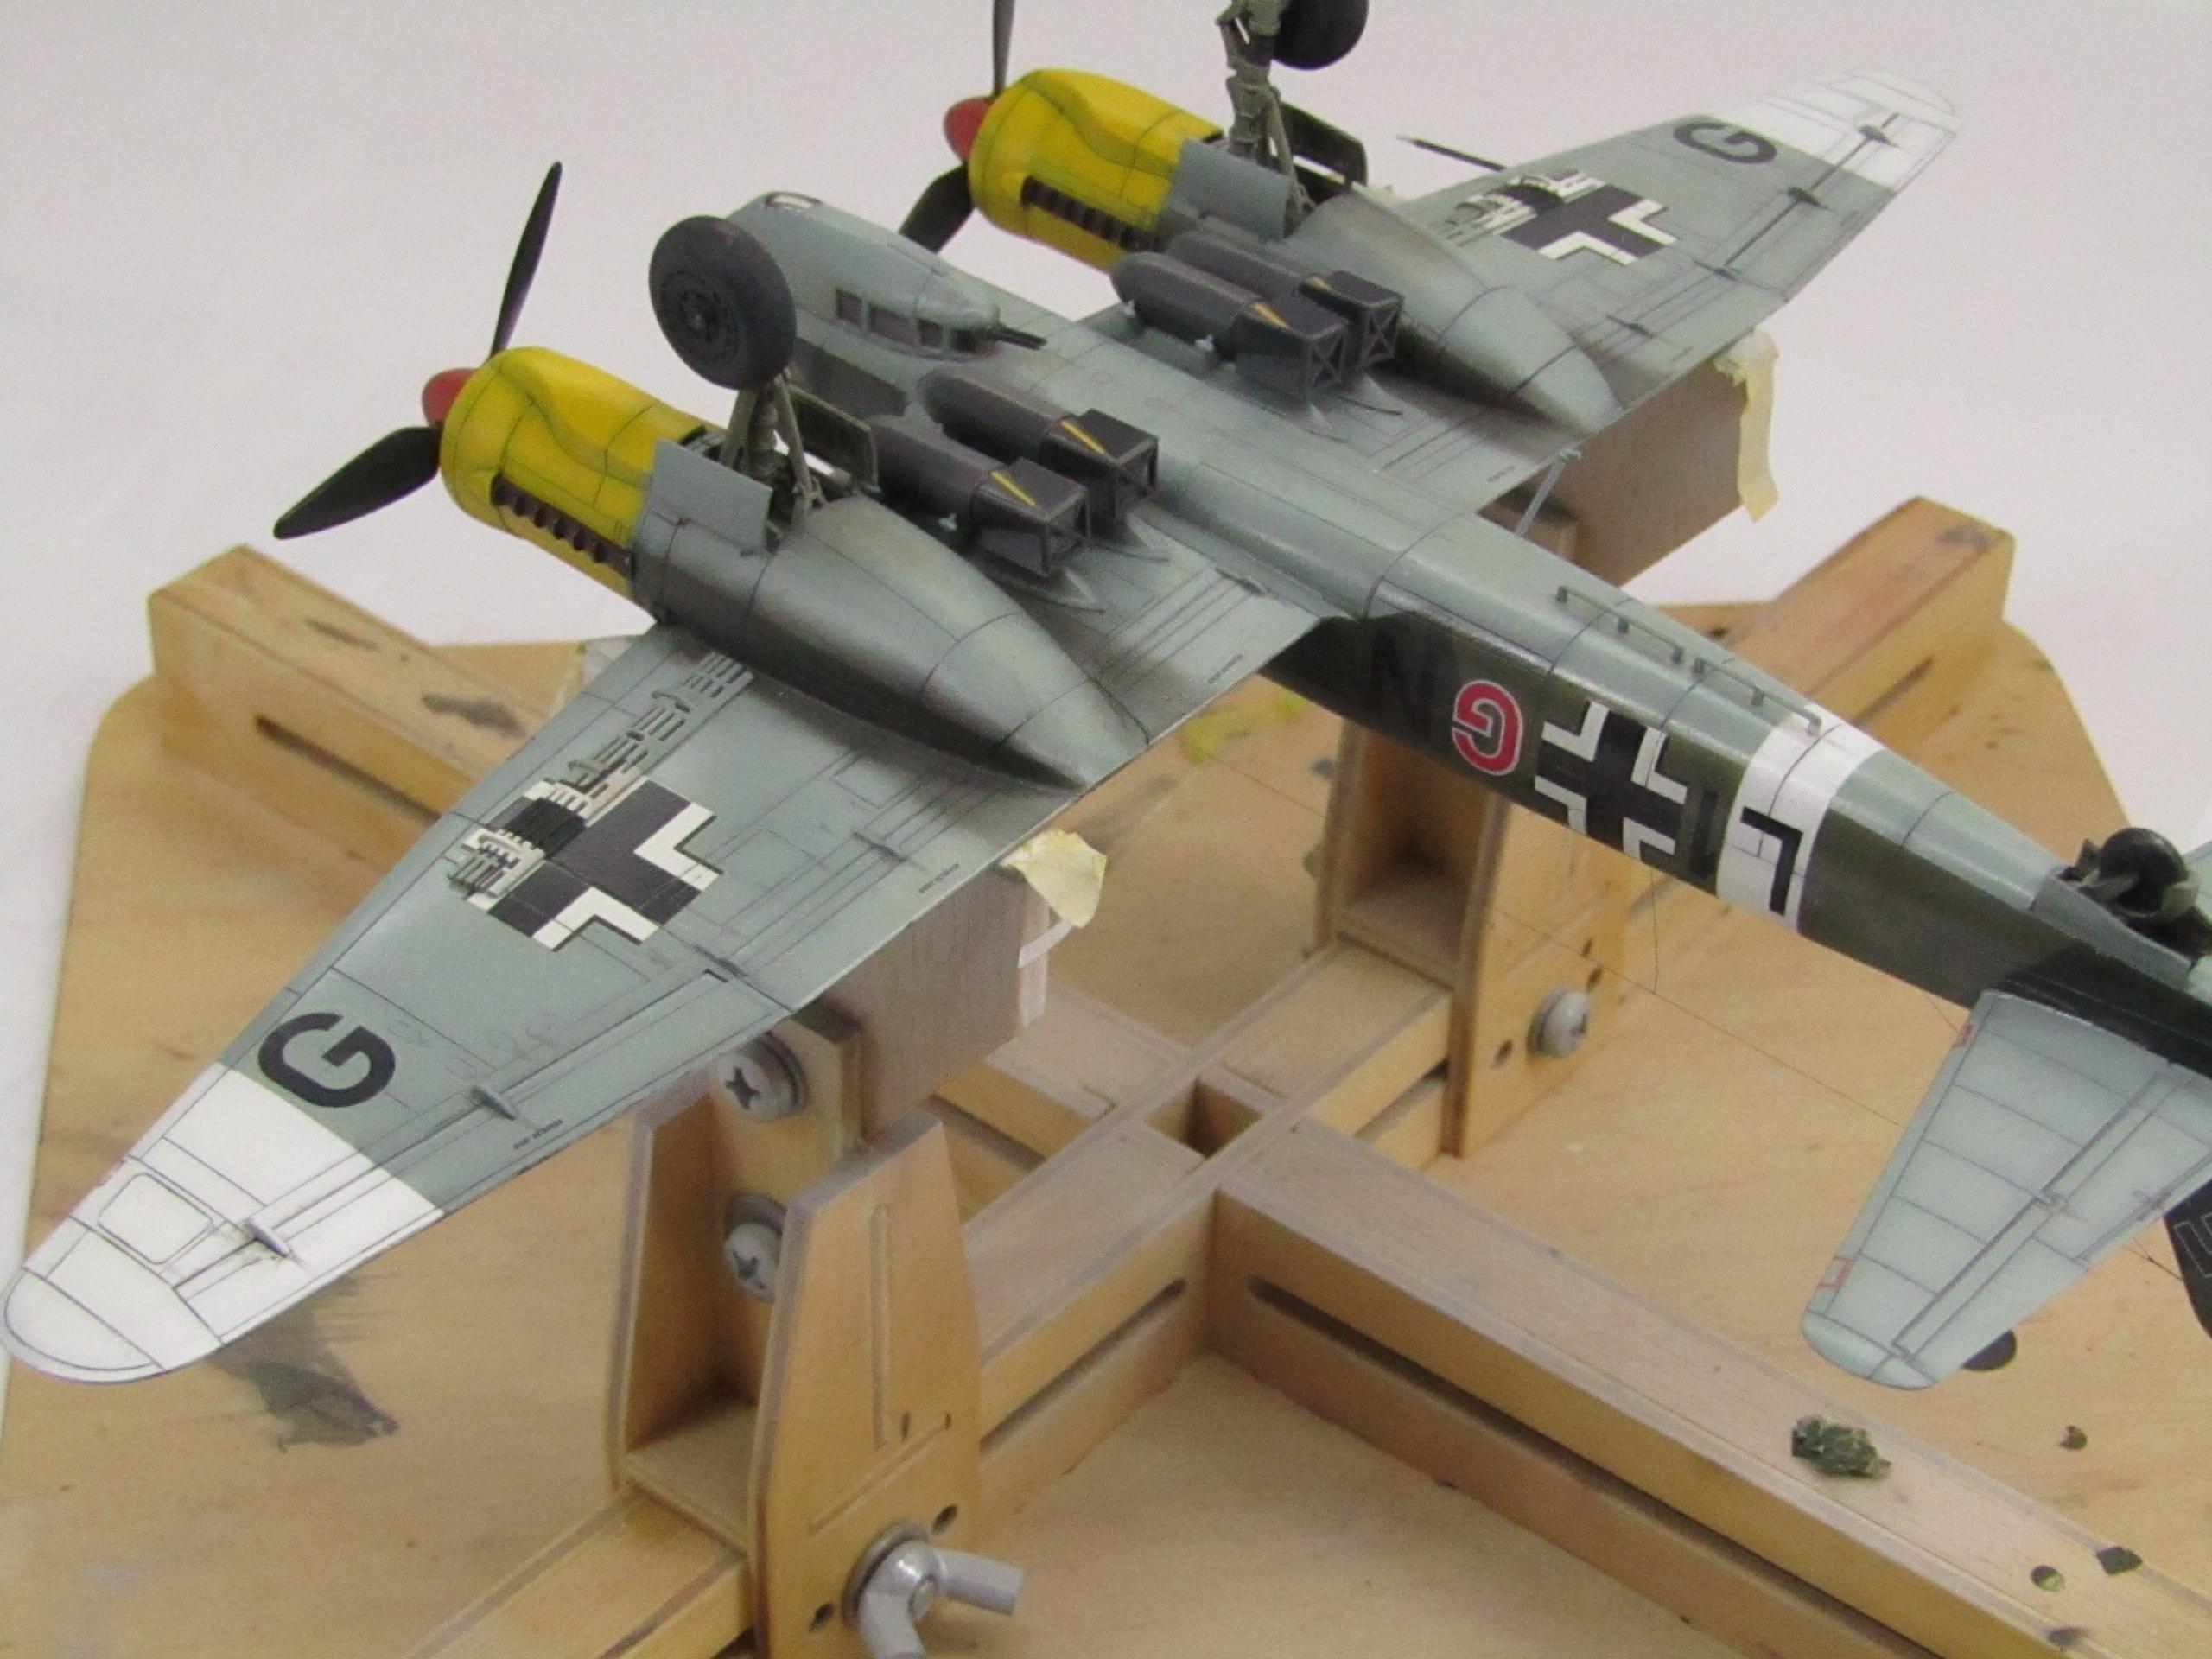 Ju-88 A-4 1/72 (Звезда) QTgyByH1Aj0